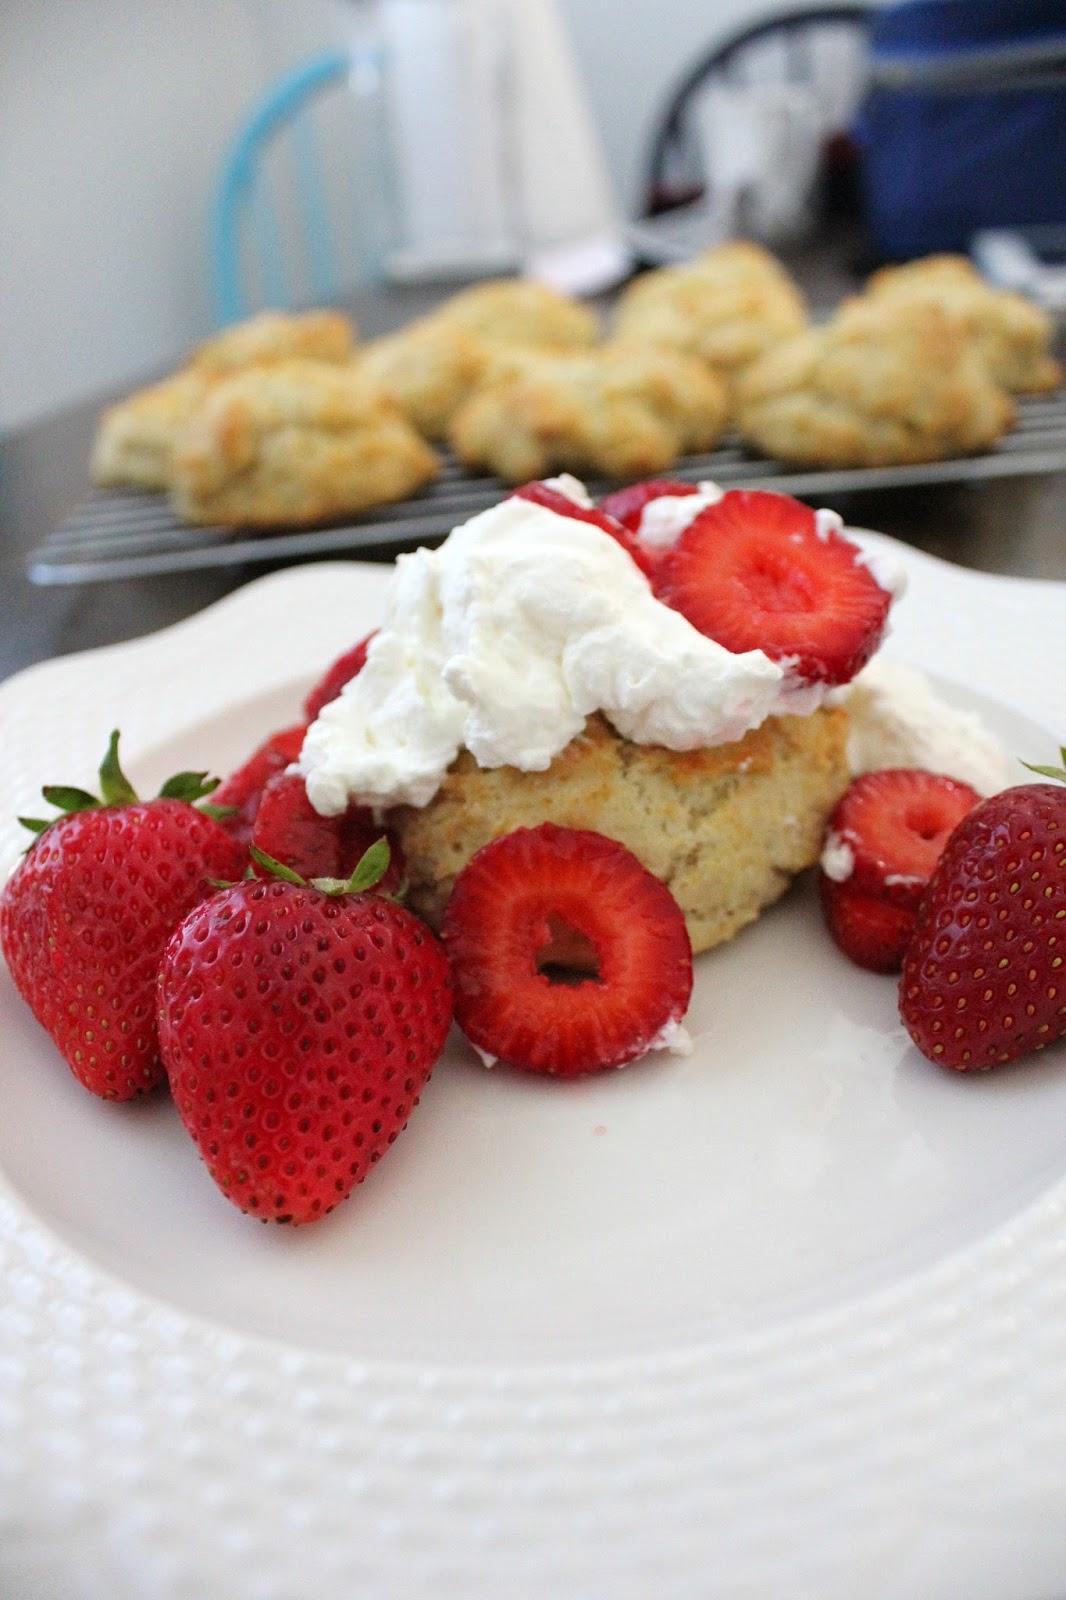 Recipe for Strawberry Shortcake by freshfromthe.com